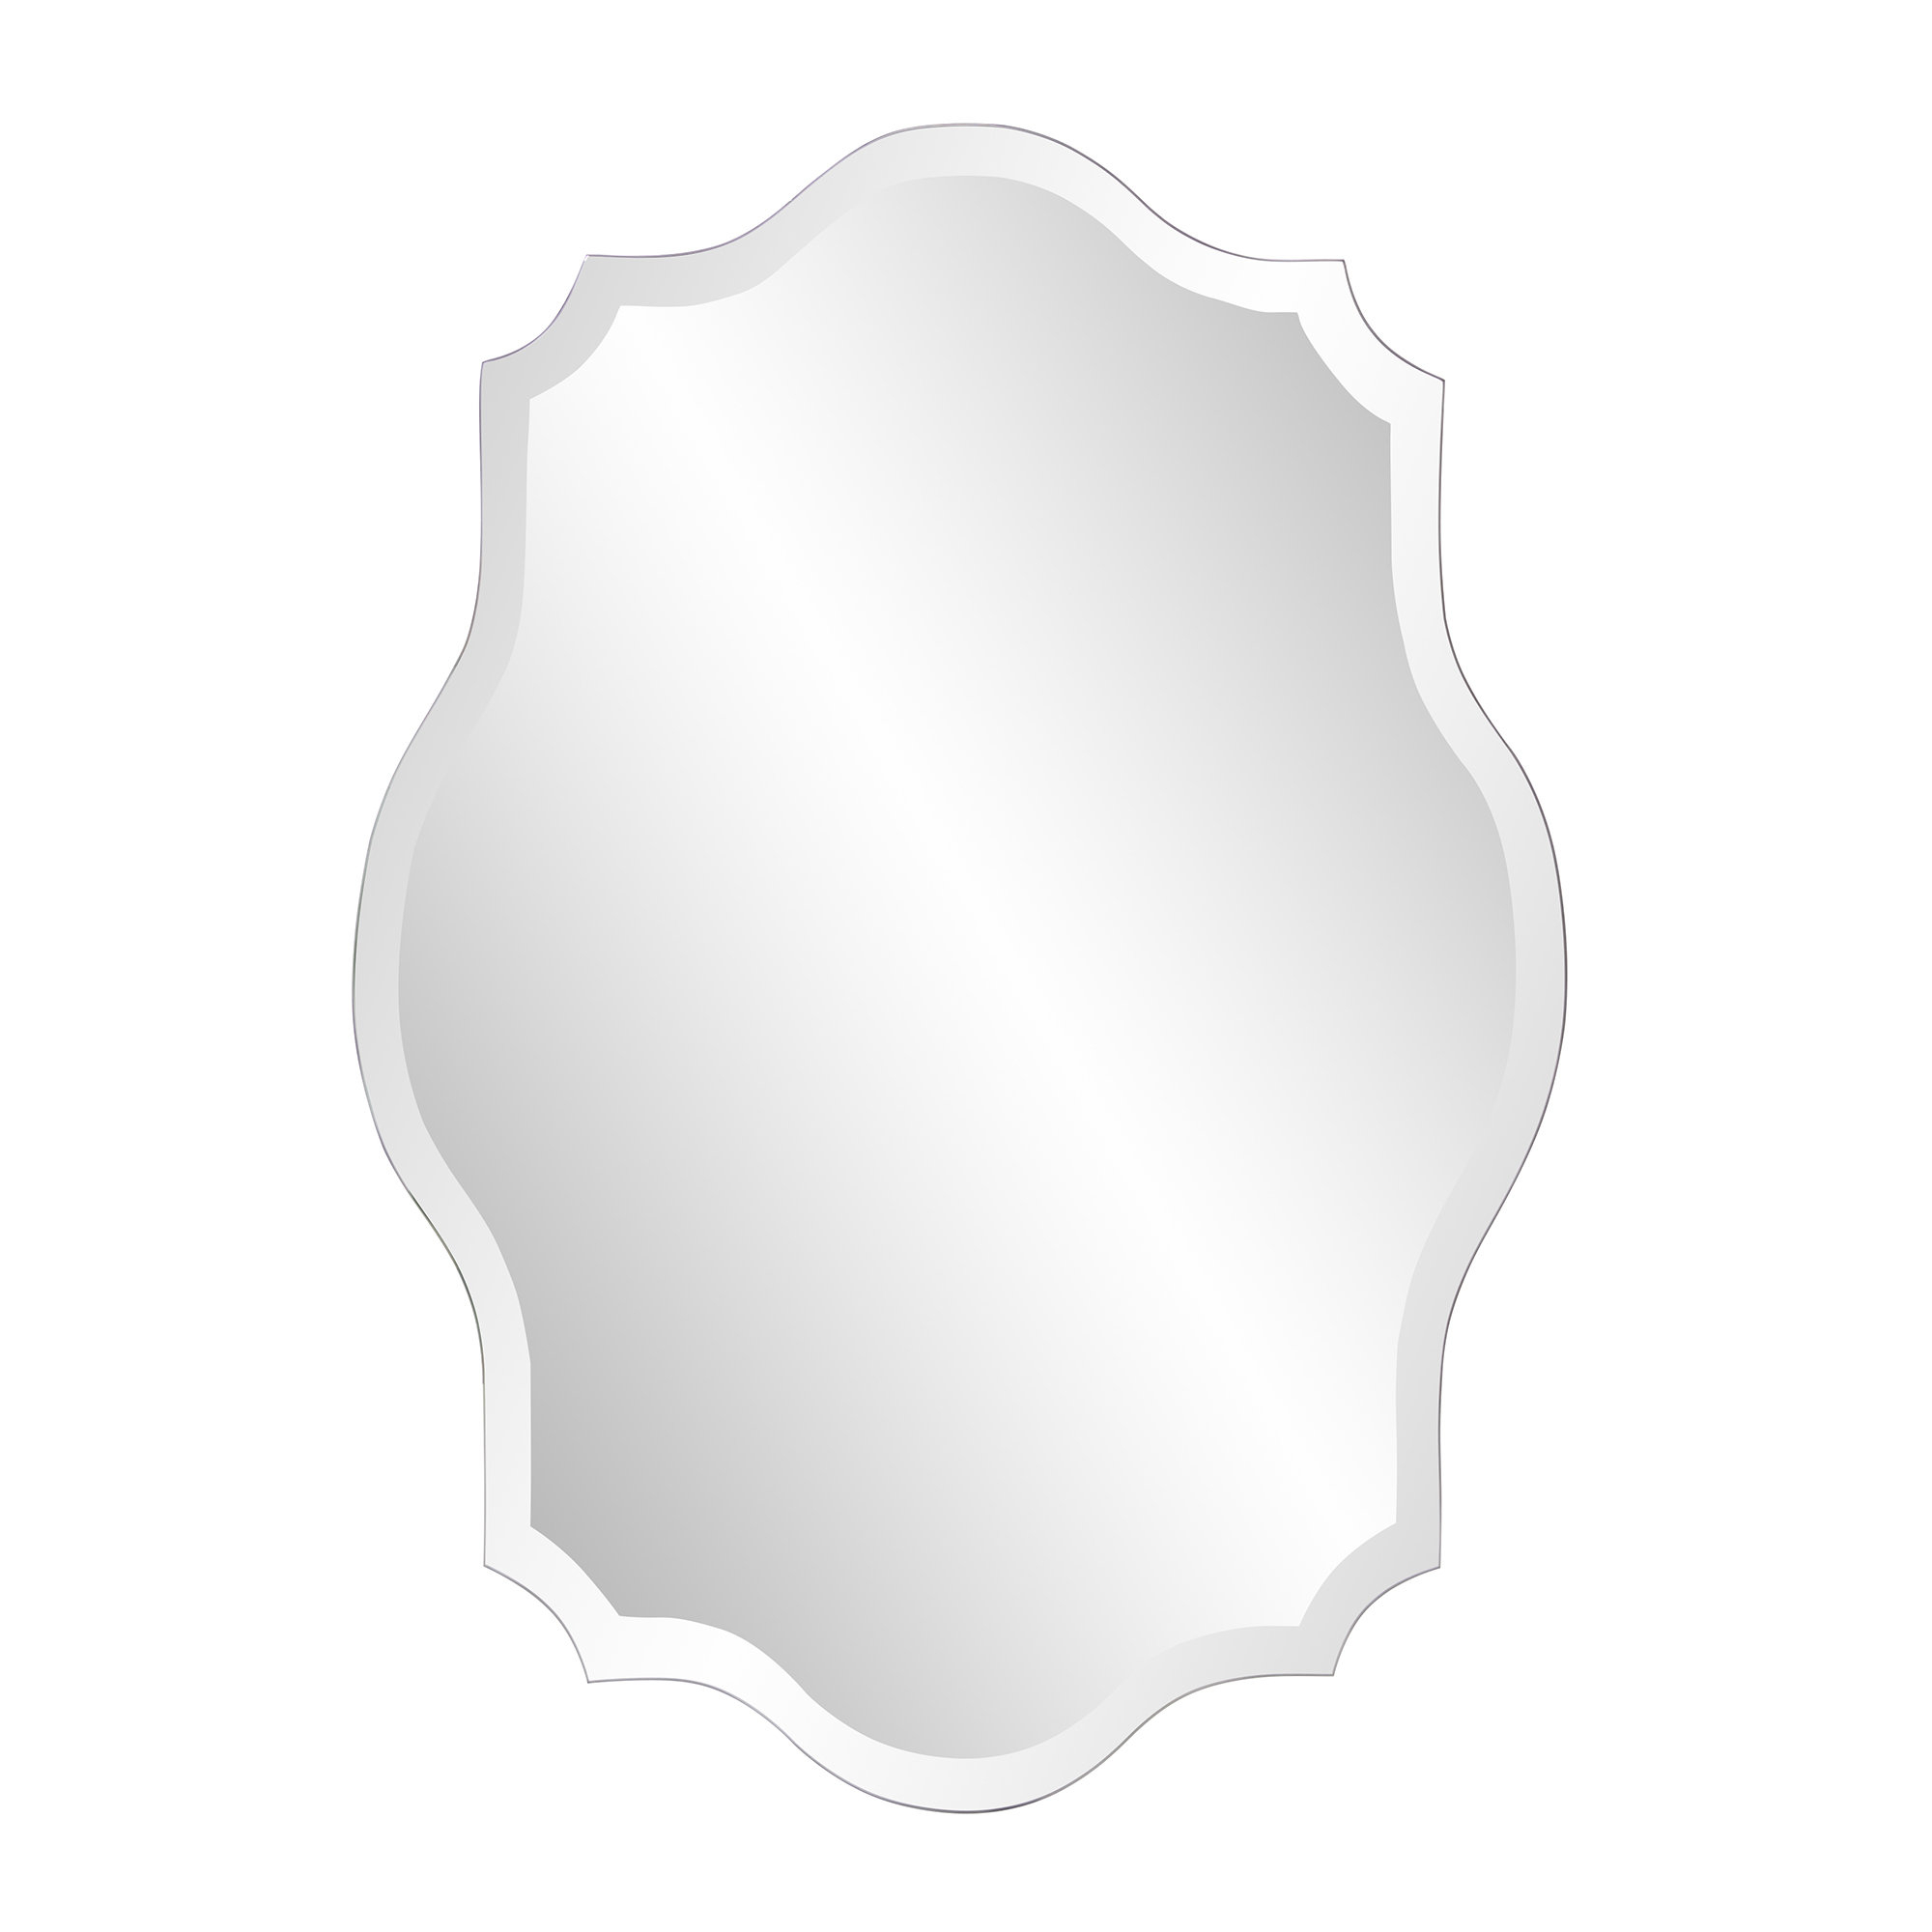 Guidinha Modern & Contemporary Accent Mirror Throughout Guidinha Modern & Contemporary Accent Mirrors (View 5 of 20)